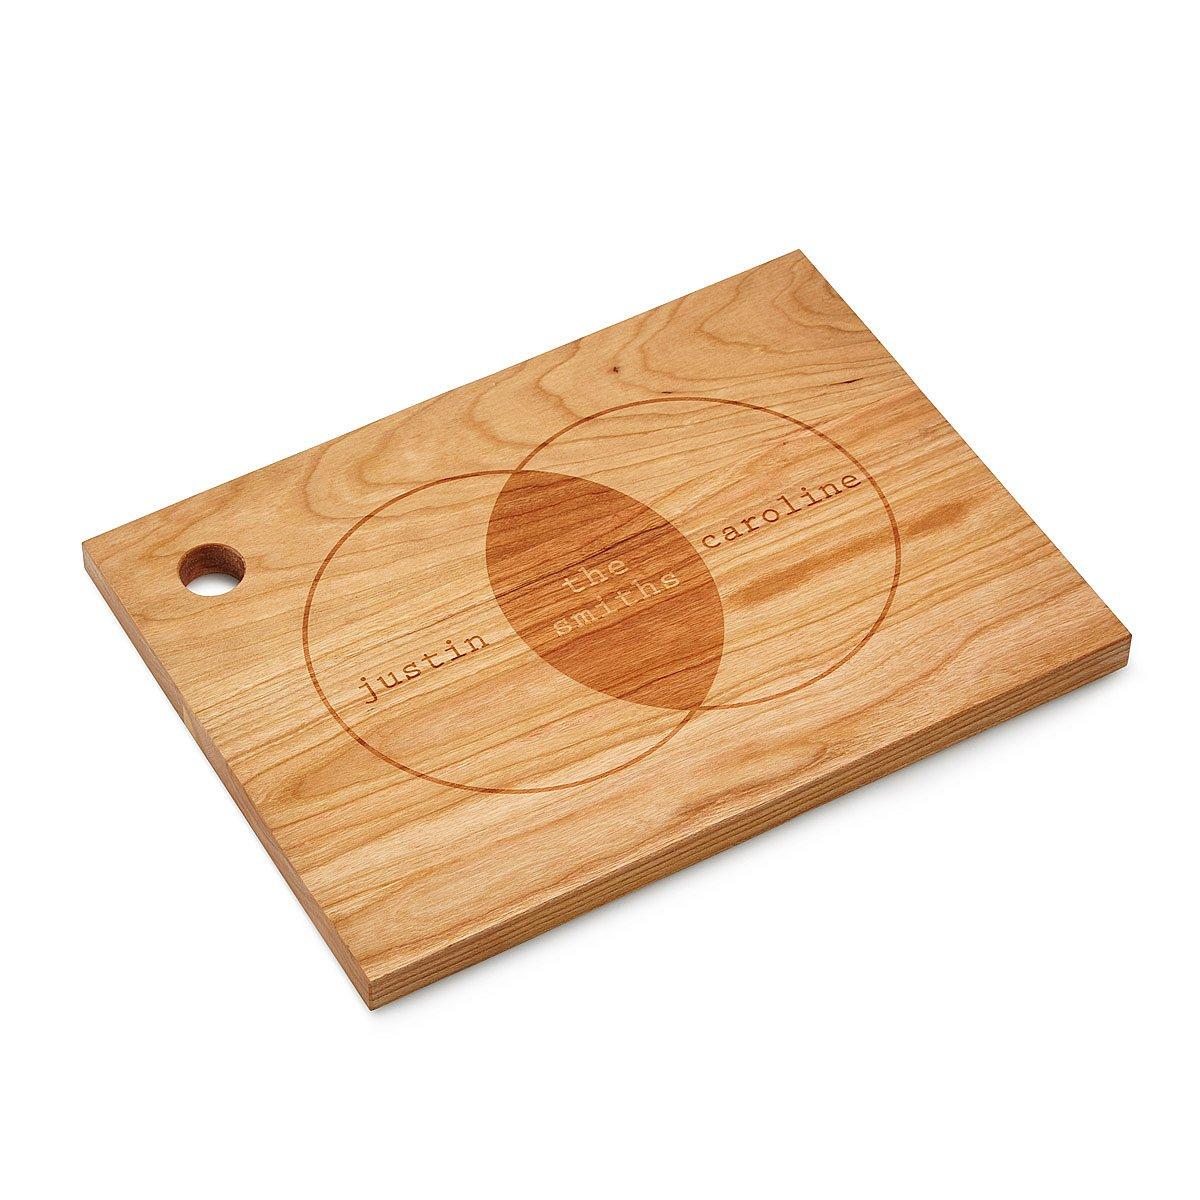 Personalized Venn Diagram Cutting Board